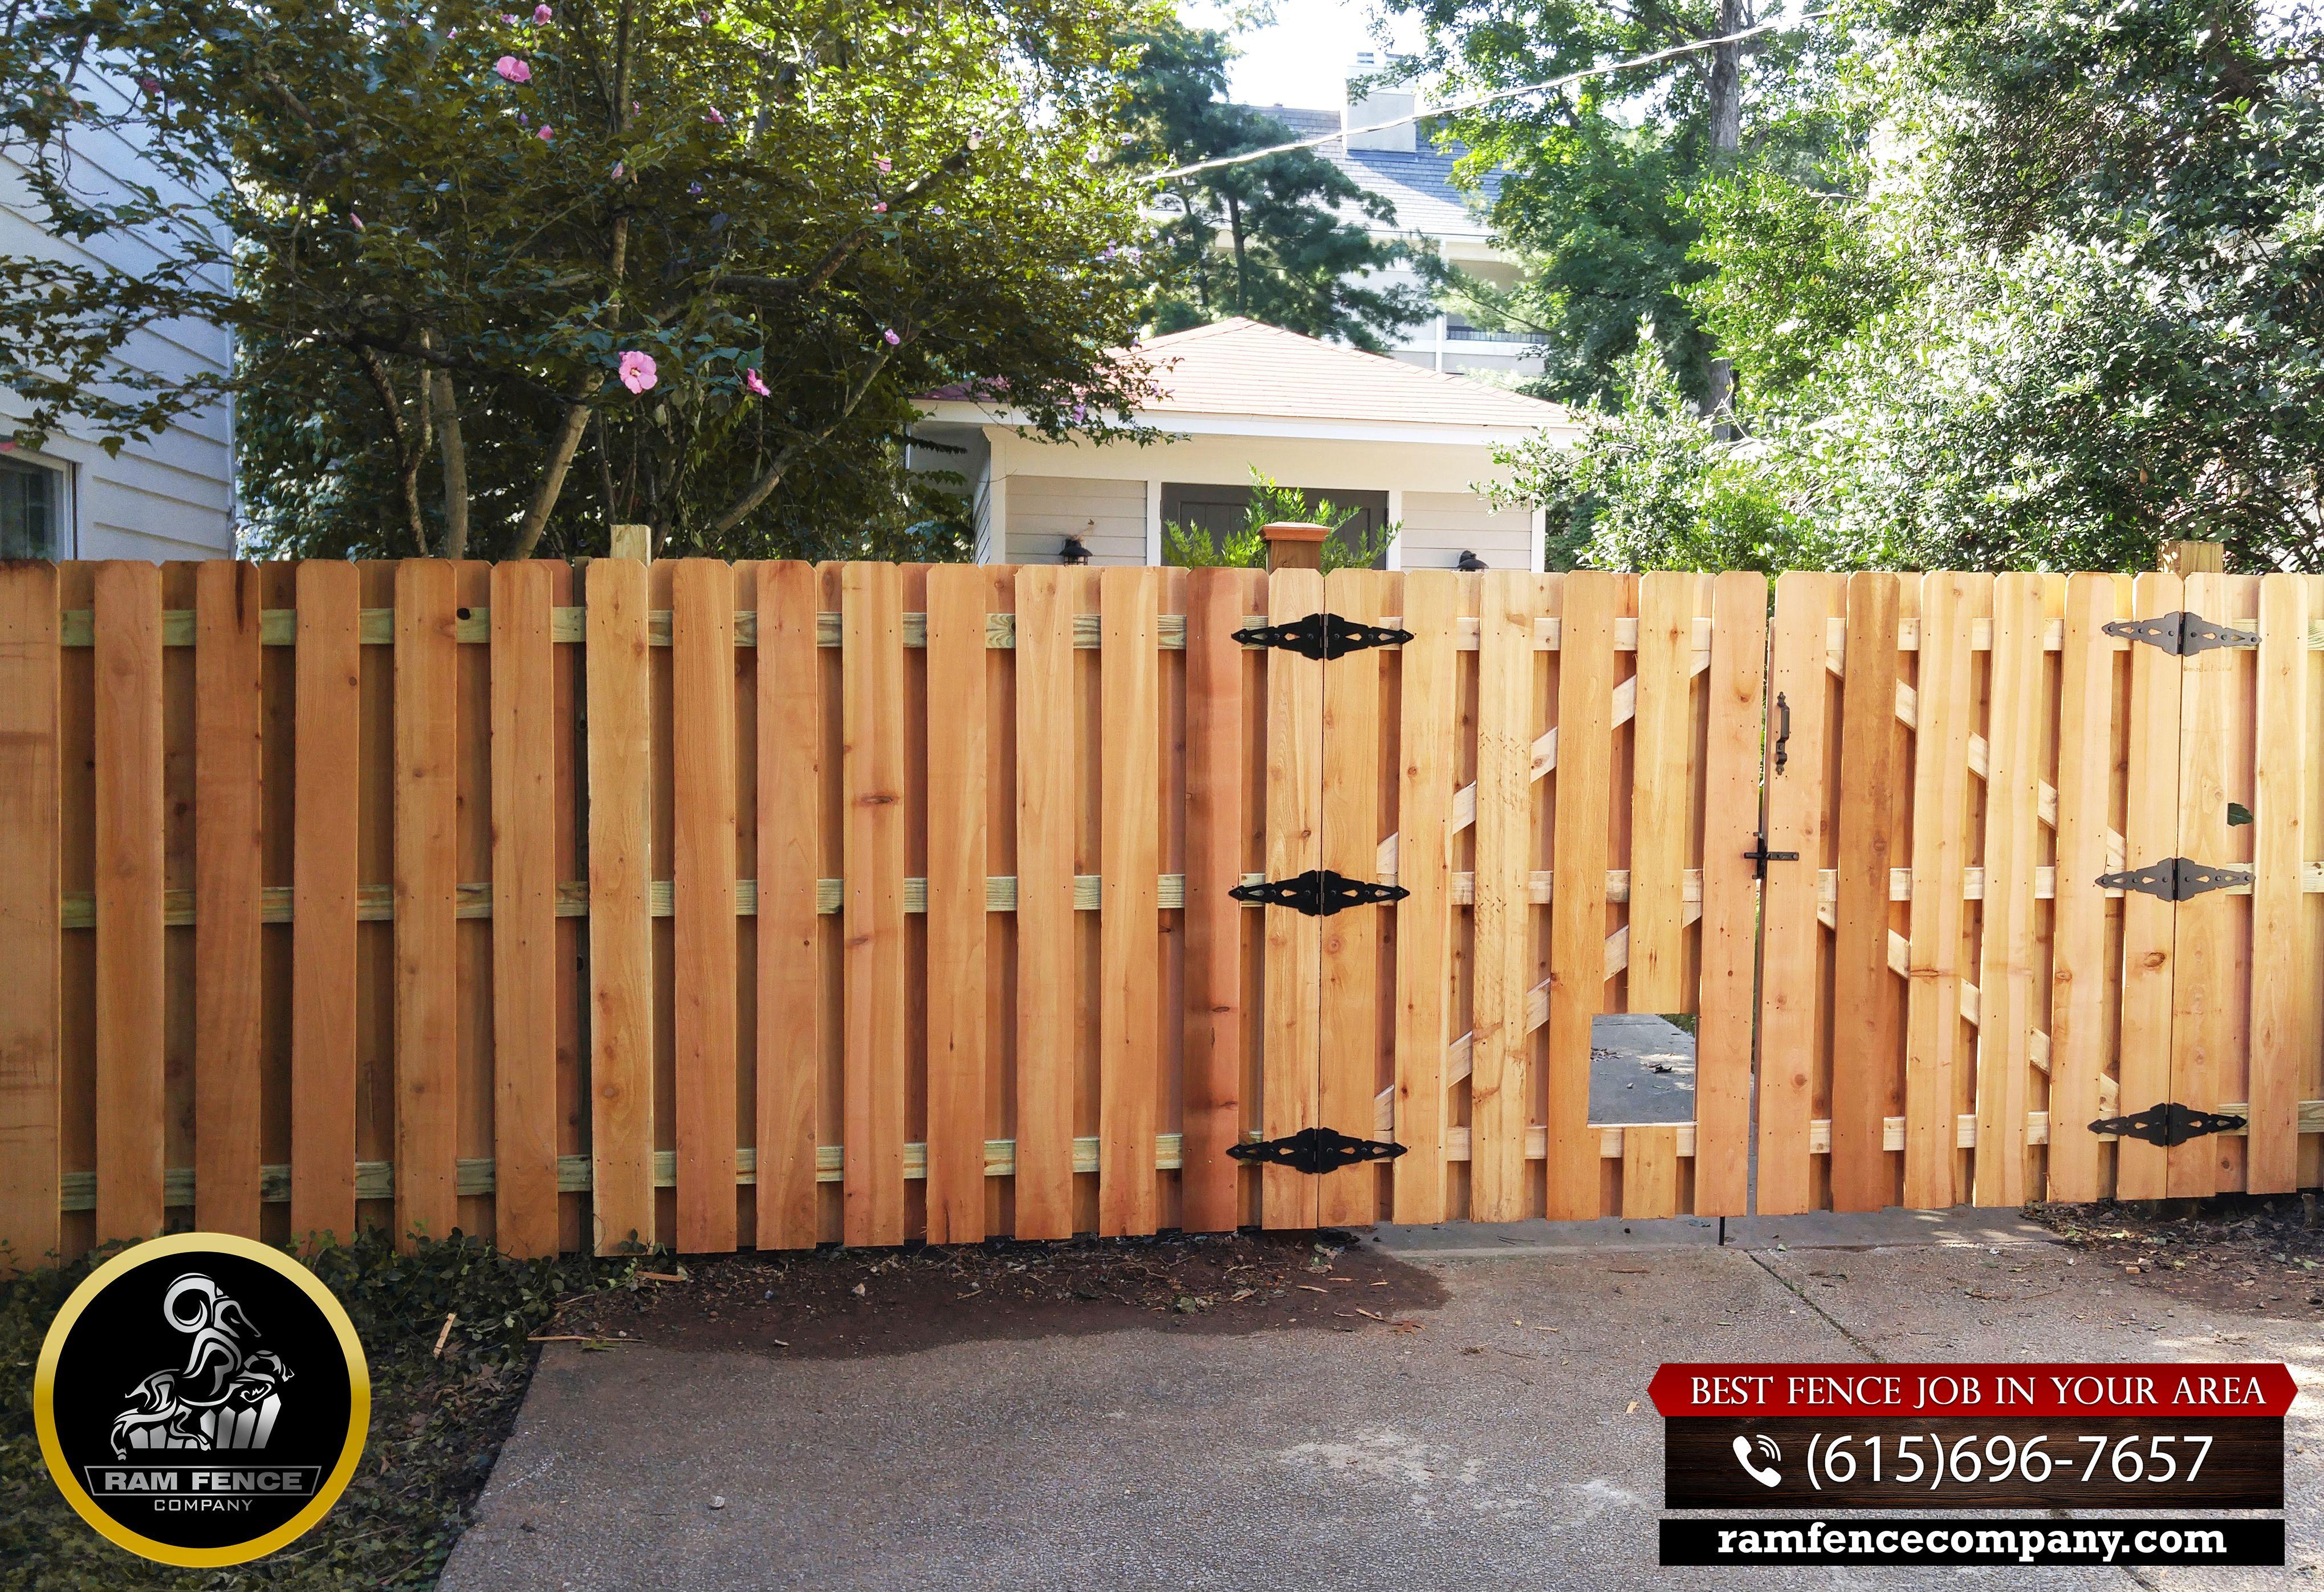 We Make Professional Installations Of Wood Fencing Vinyl Fencing Aluminium Fencing Metal Fencing Chain Link Fencing Wood Fence Aluminum Fence Farm Fence